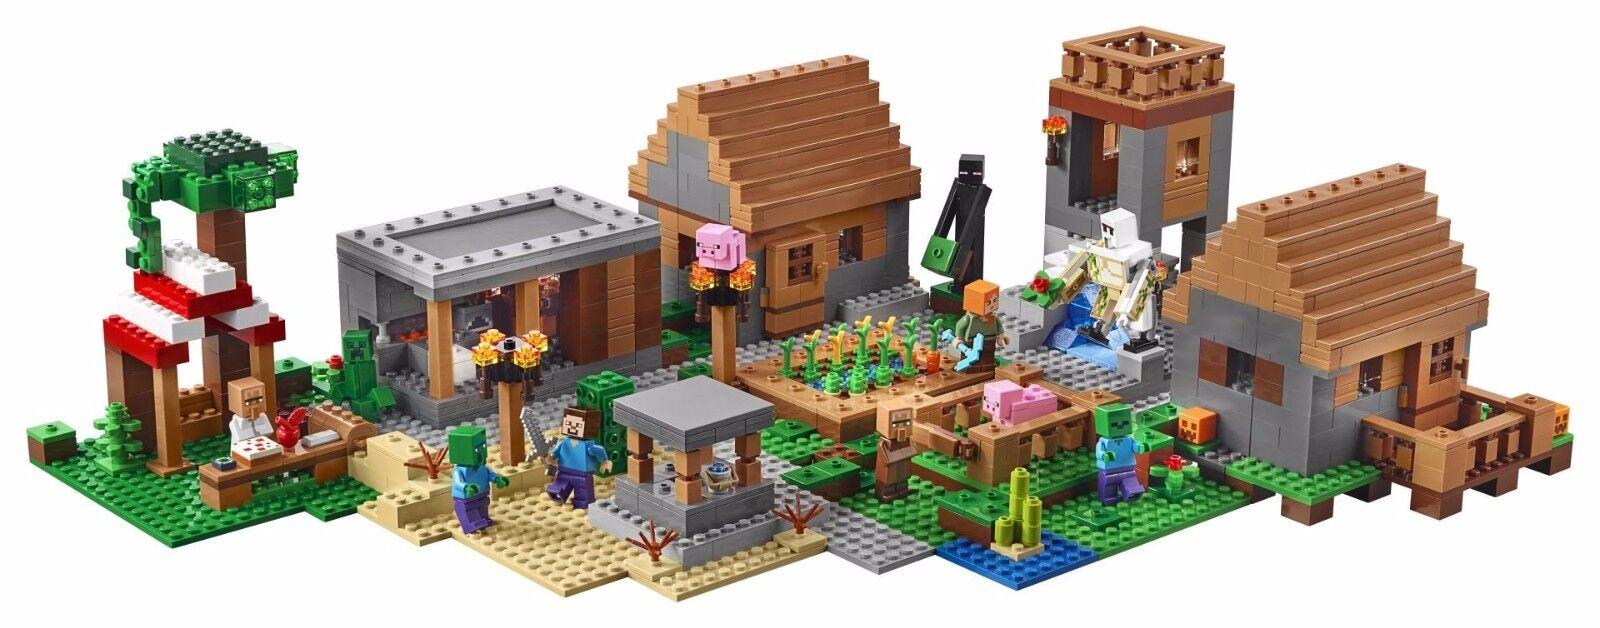 Lego 21128 le village-The Village-NEUF NEUF dans sa boîte RARE